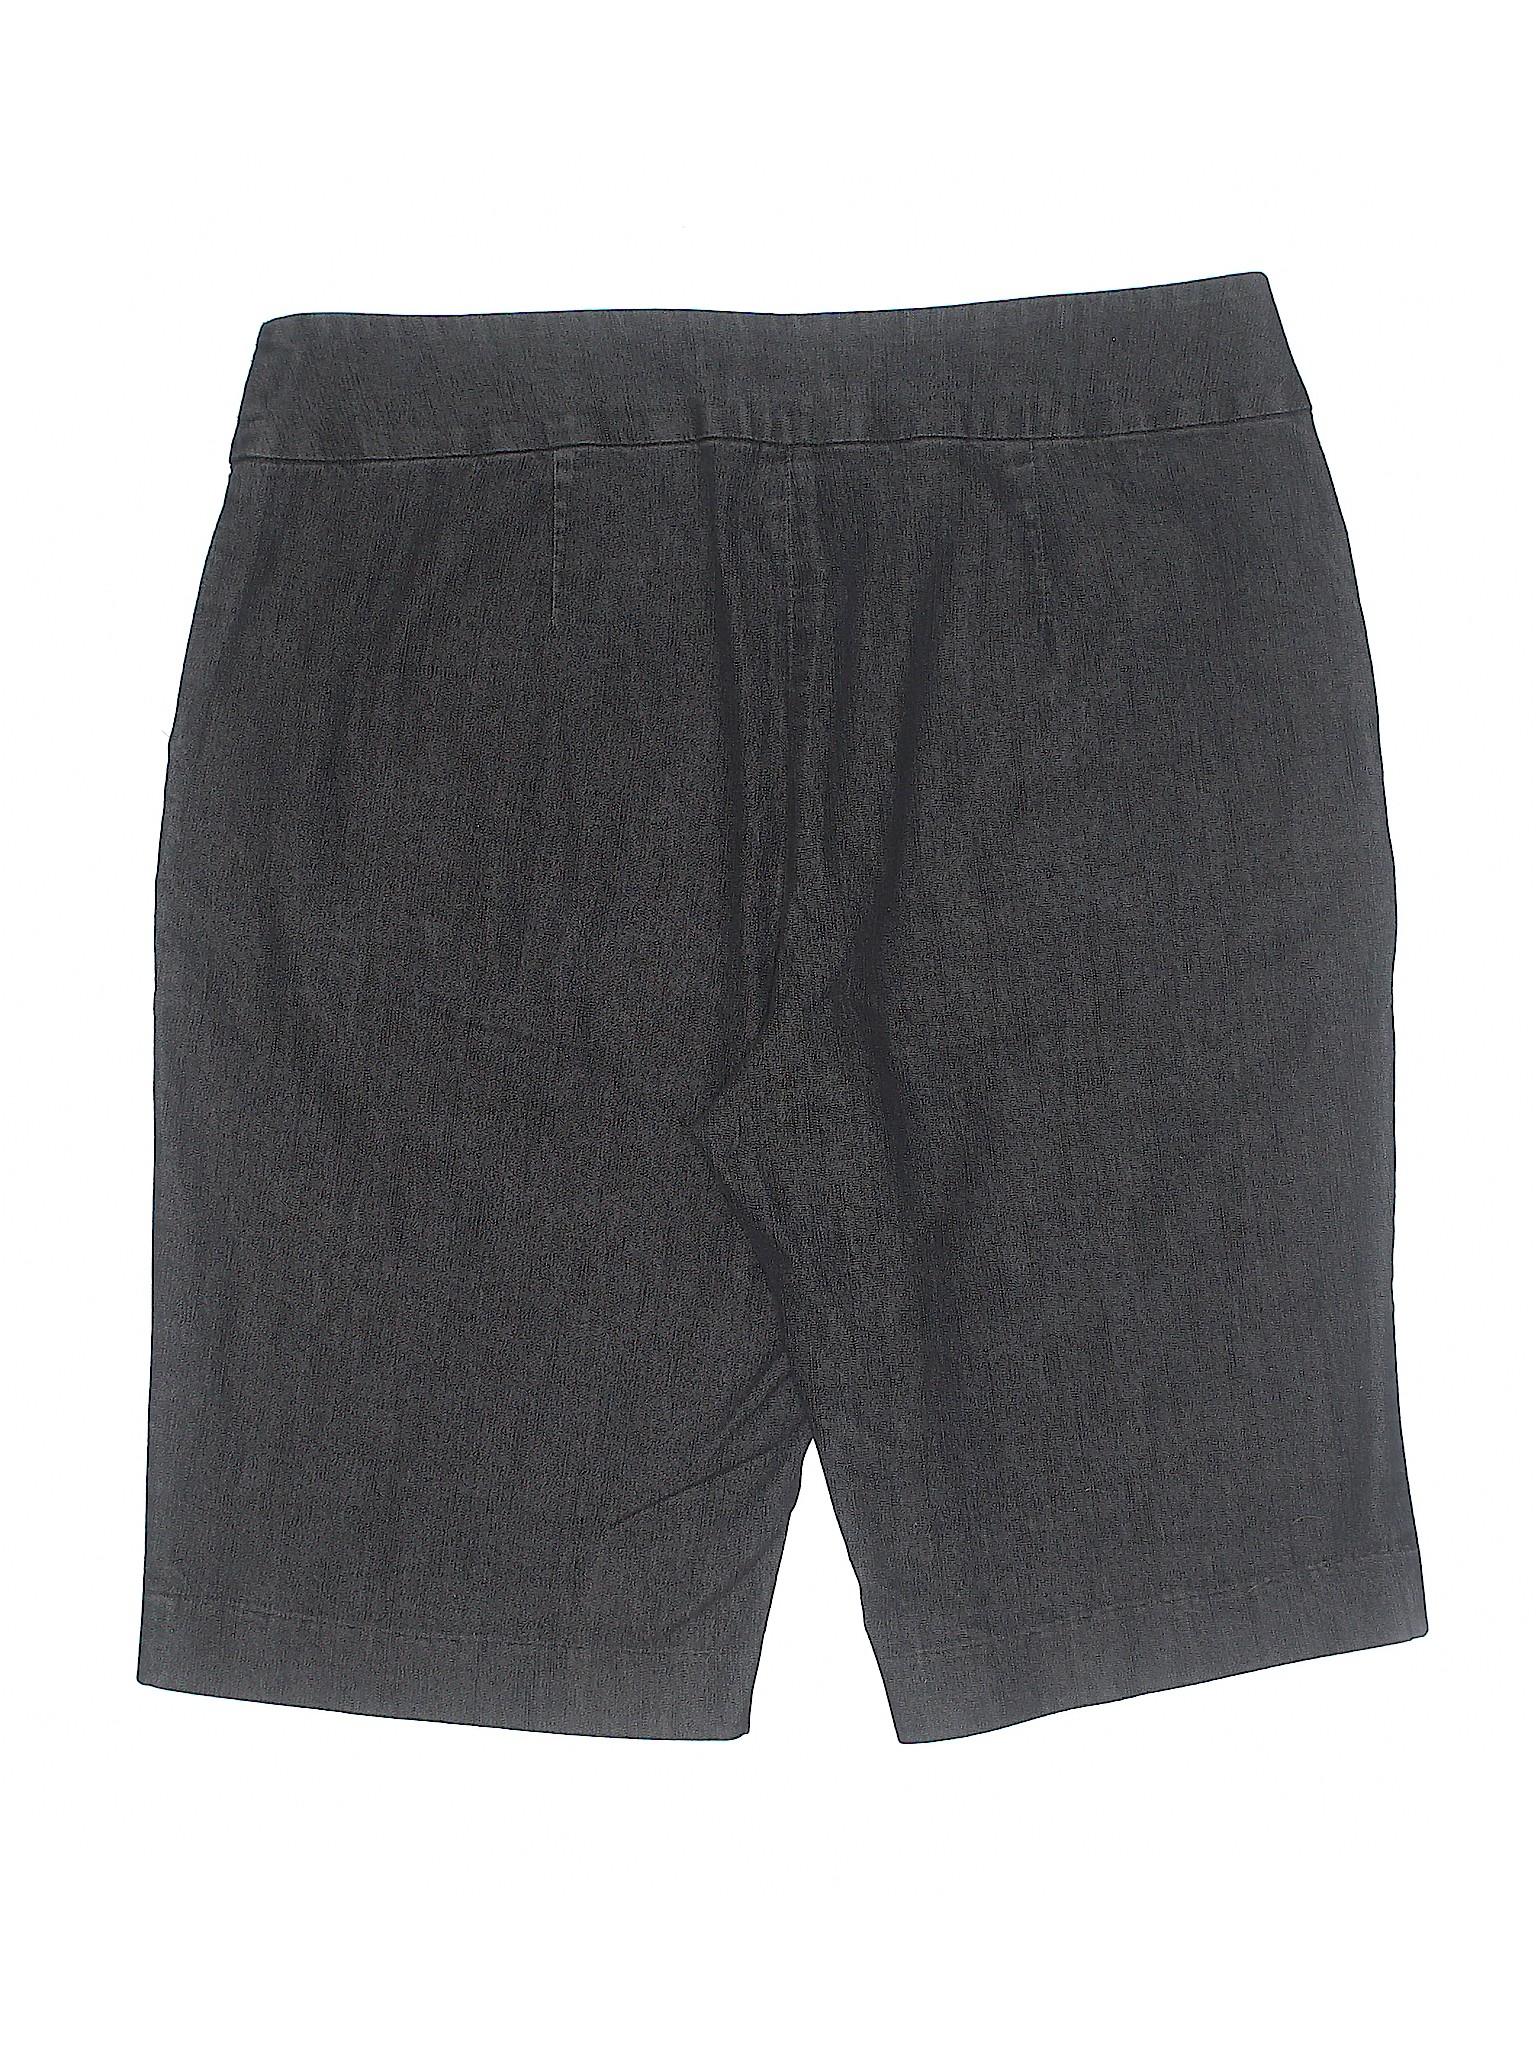 Shorts Shorts Sandro Boutique Shorts Boutique Sandro Sandro Shorts Boutique Sandro Boutique Shorts Boutique Sandro HwqfO